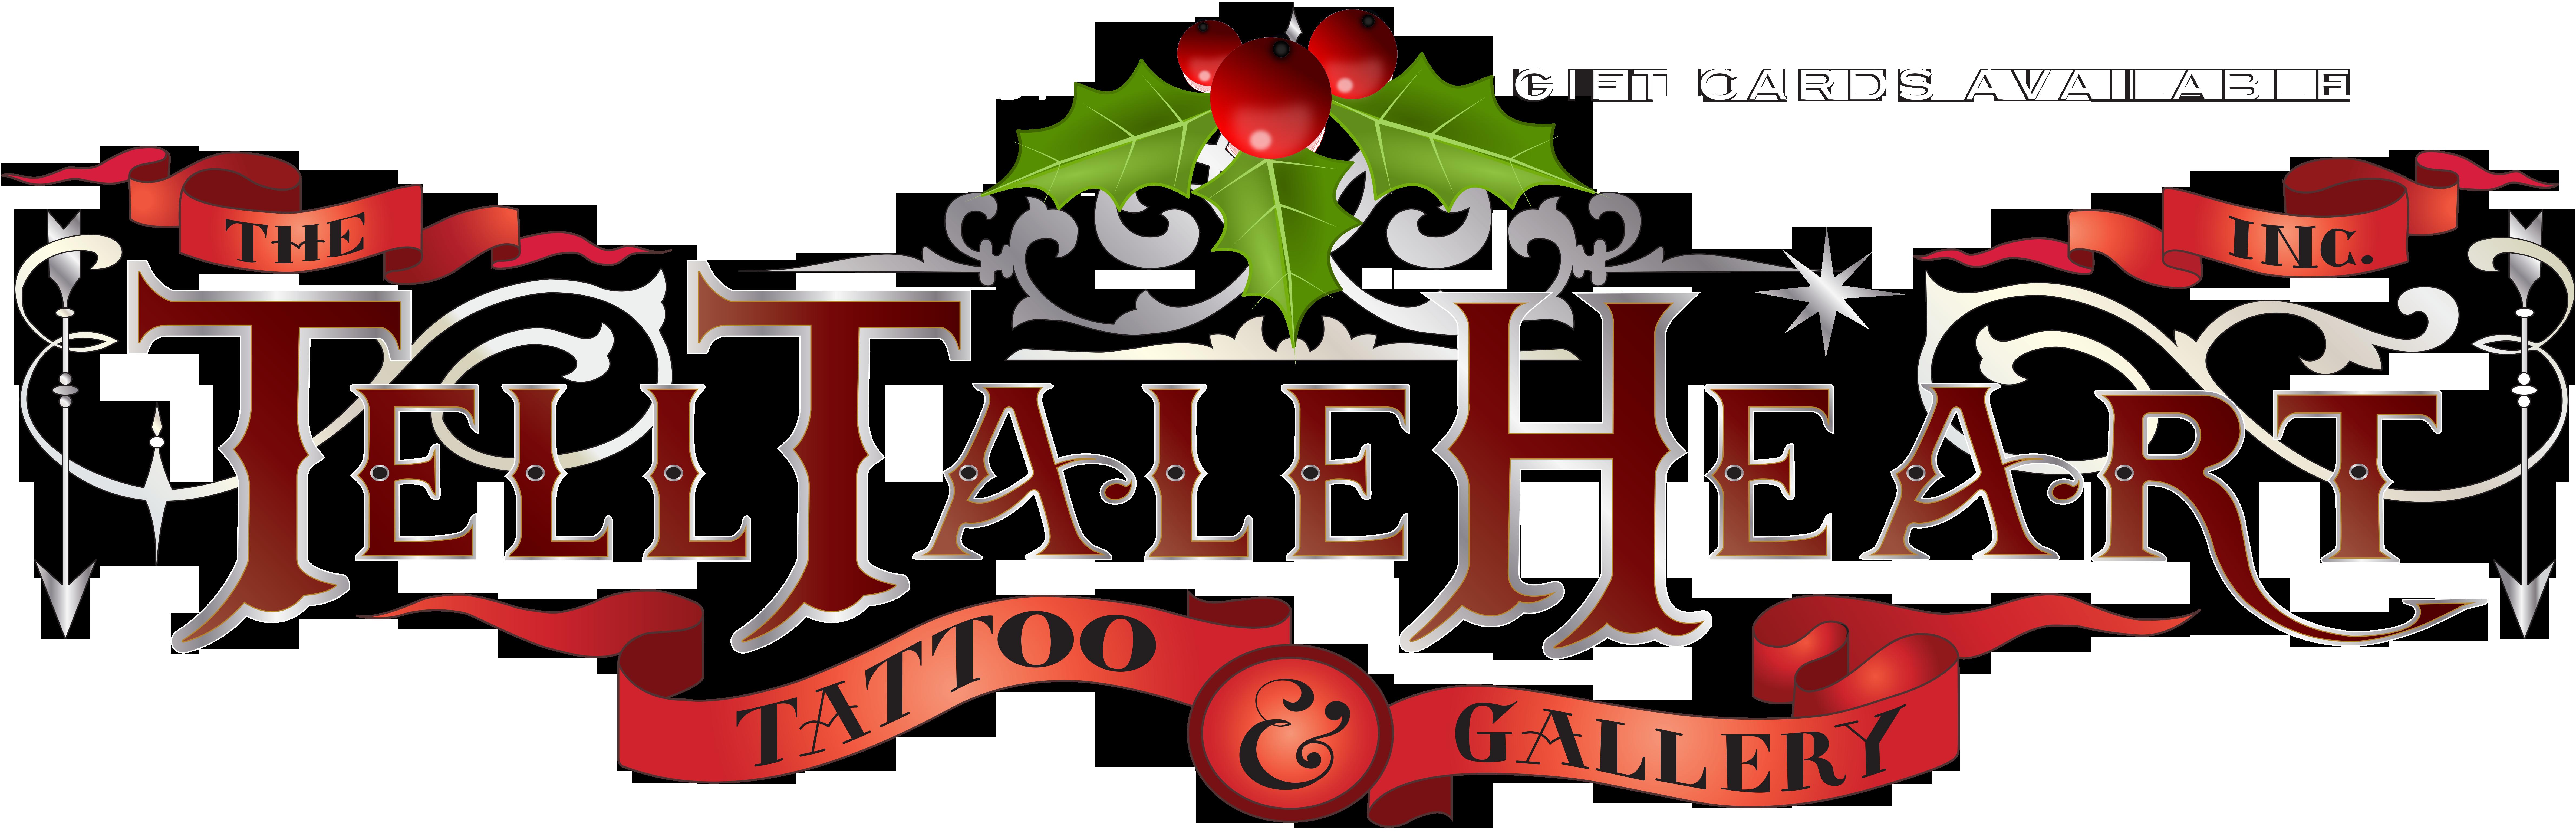 Tell tale heart clipart banner royalty free stock telltaleheart_logo_holidays | The Tell Tale Heart Tattoo & Gallery banner royalty free stock